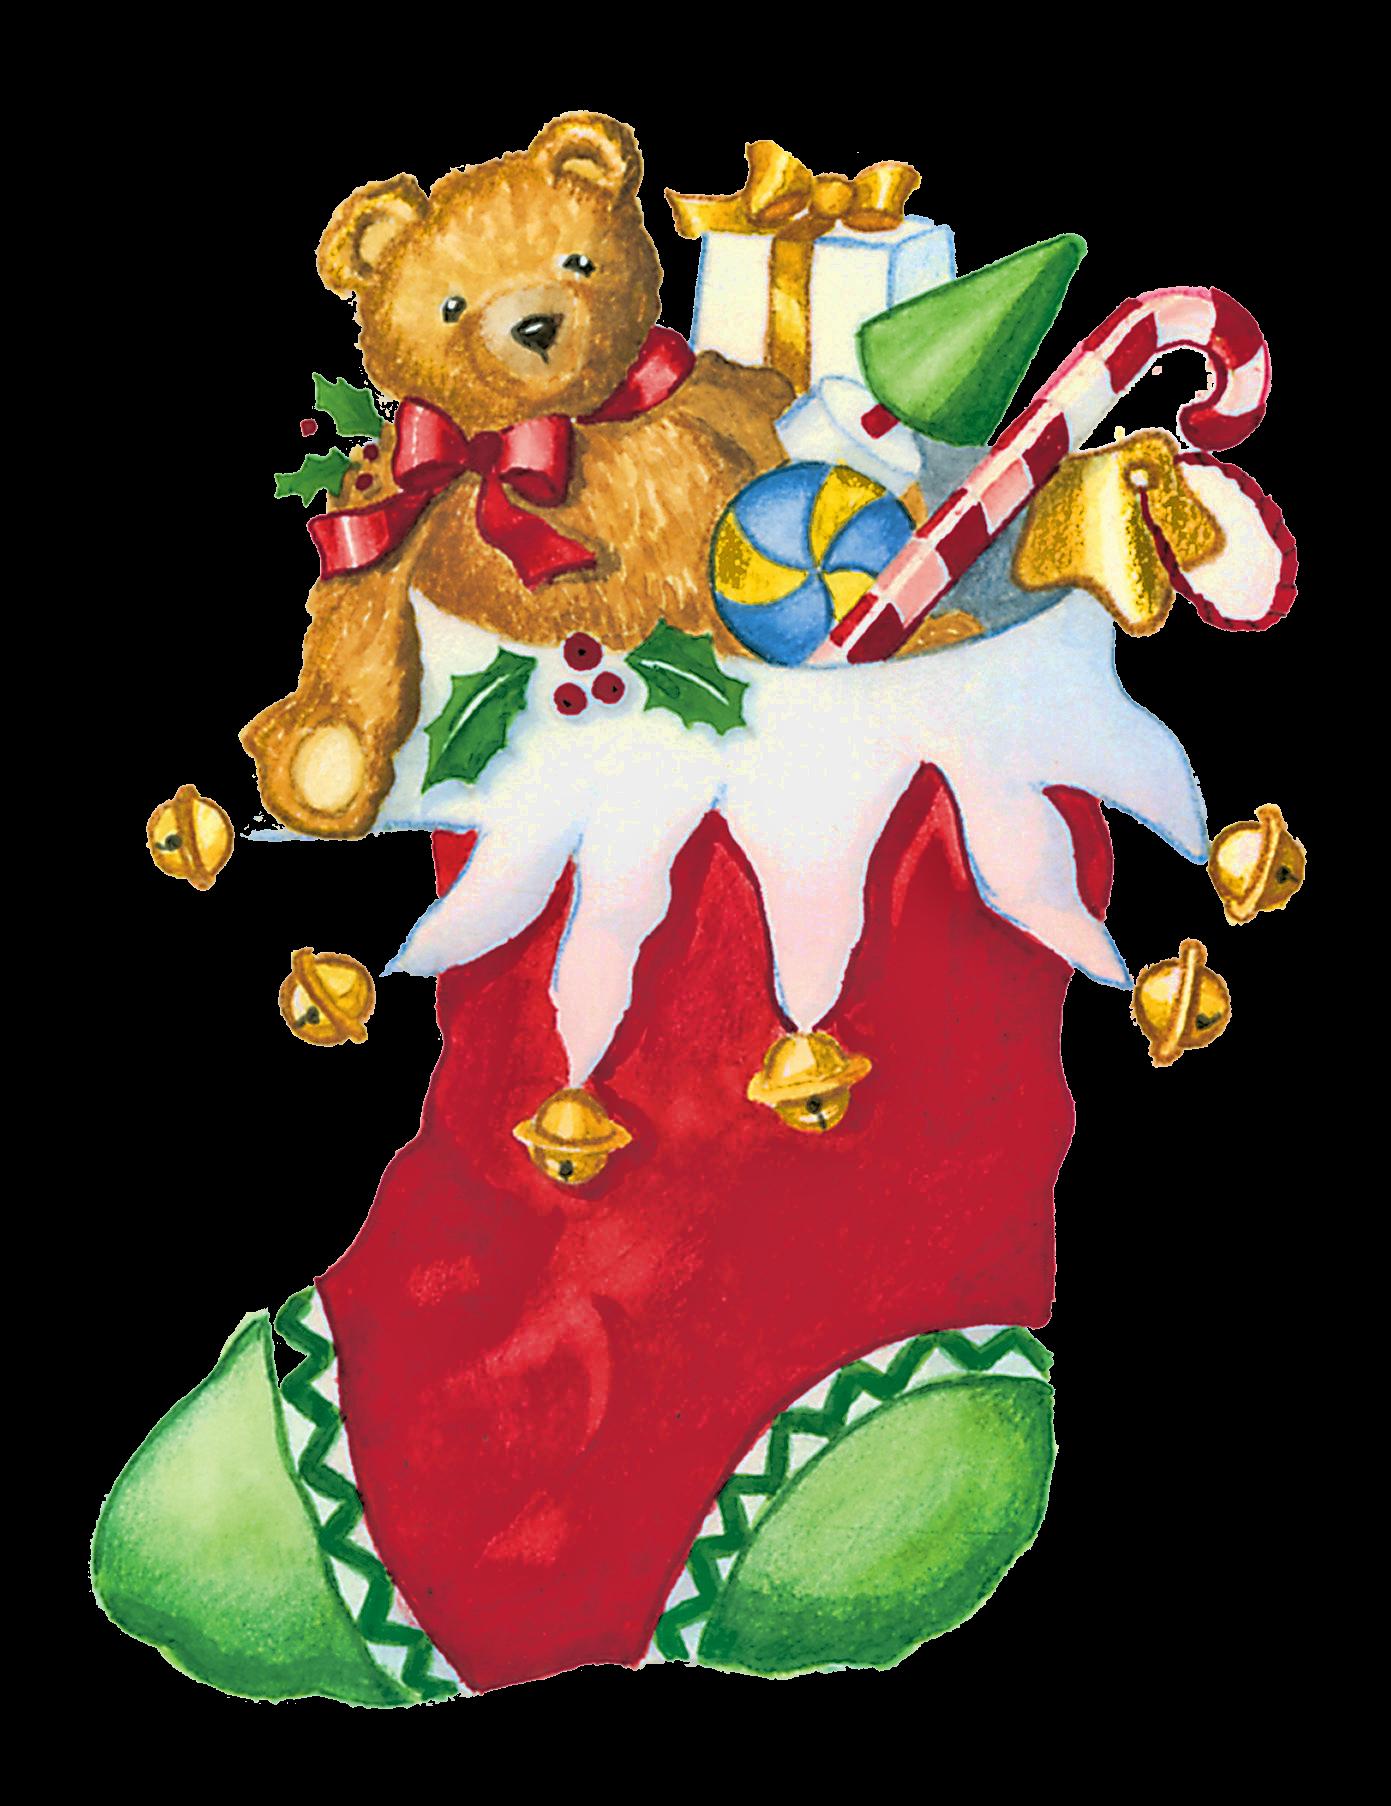 Christmas Stocking Clip Art Free Christmas Stocking With